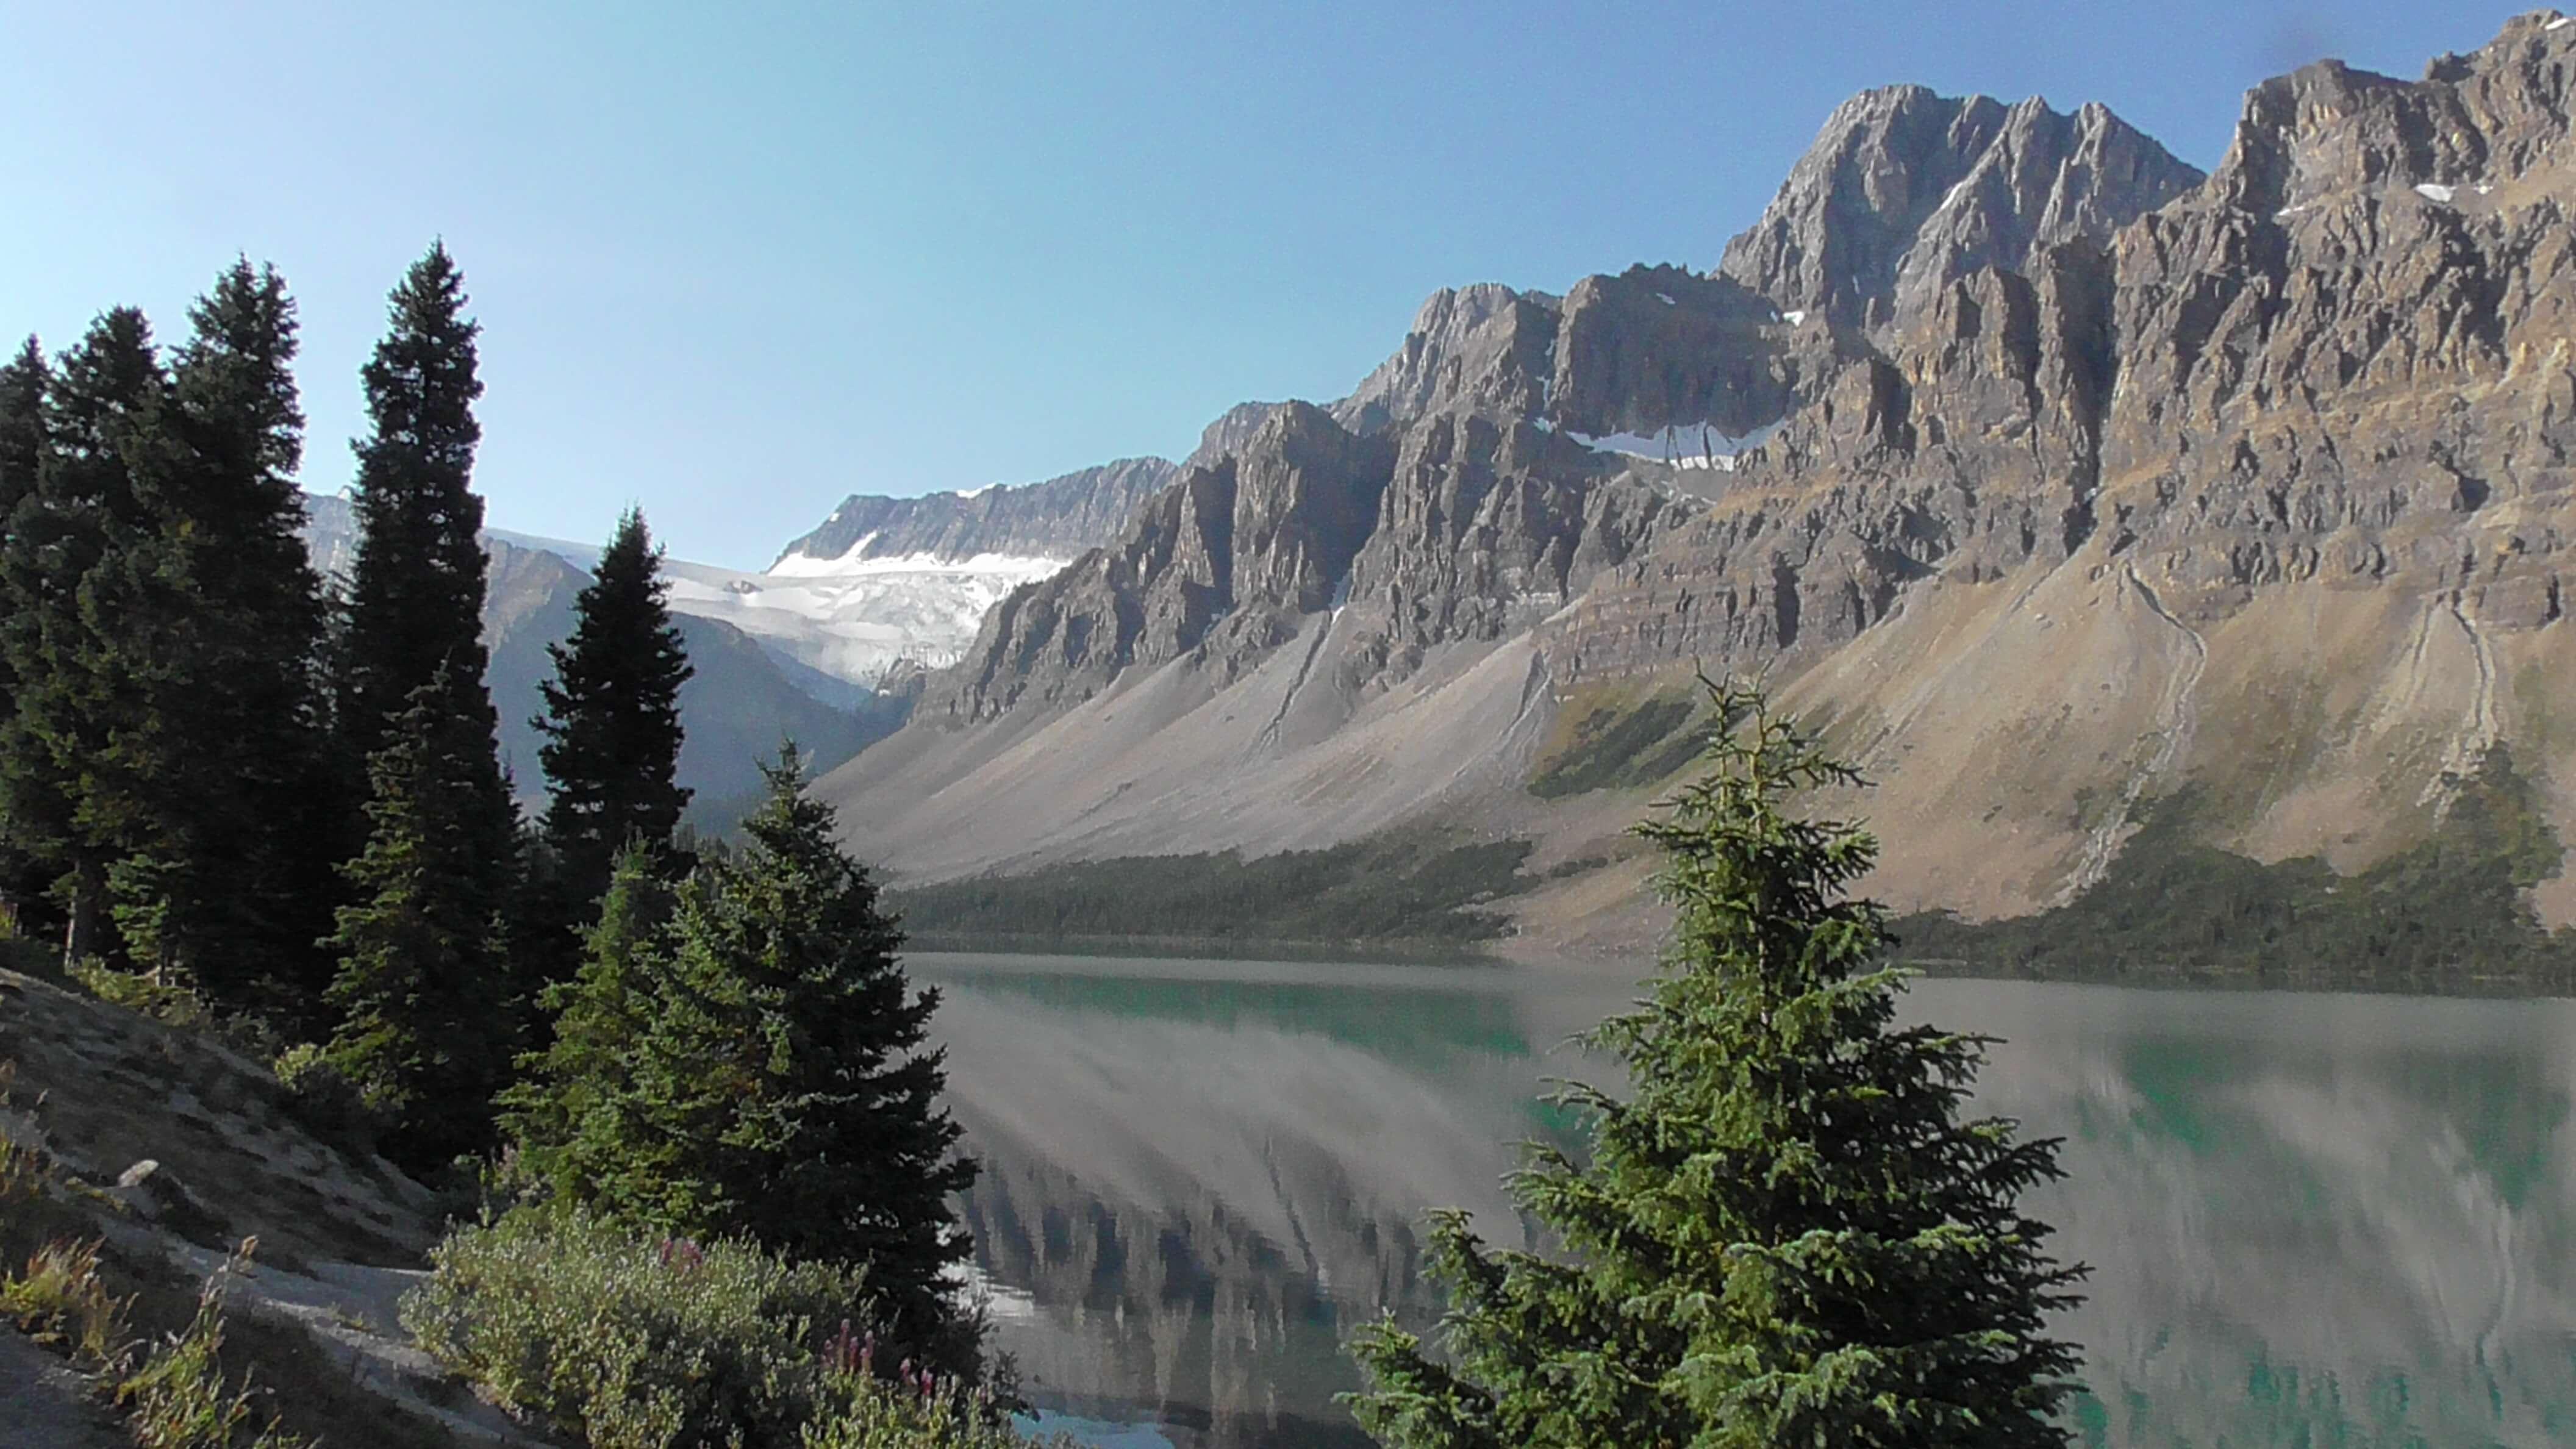 Bow Lake, Banff National Park, Alberta